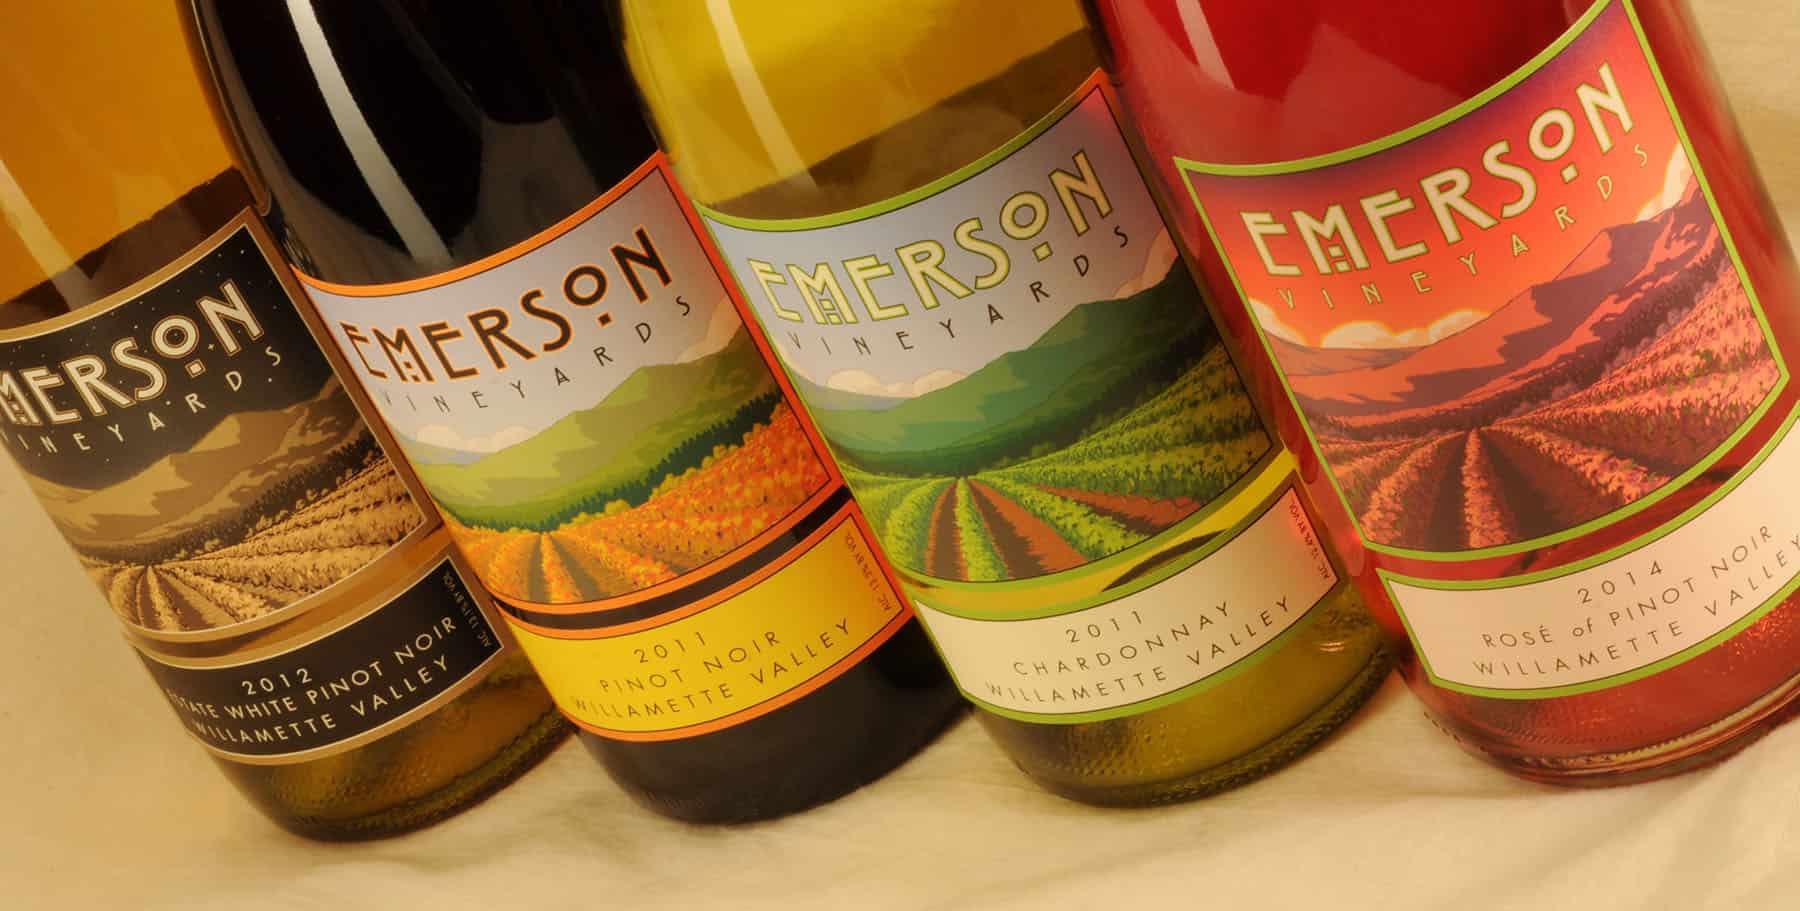 Emerson Vineyard group of bottles